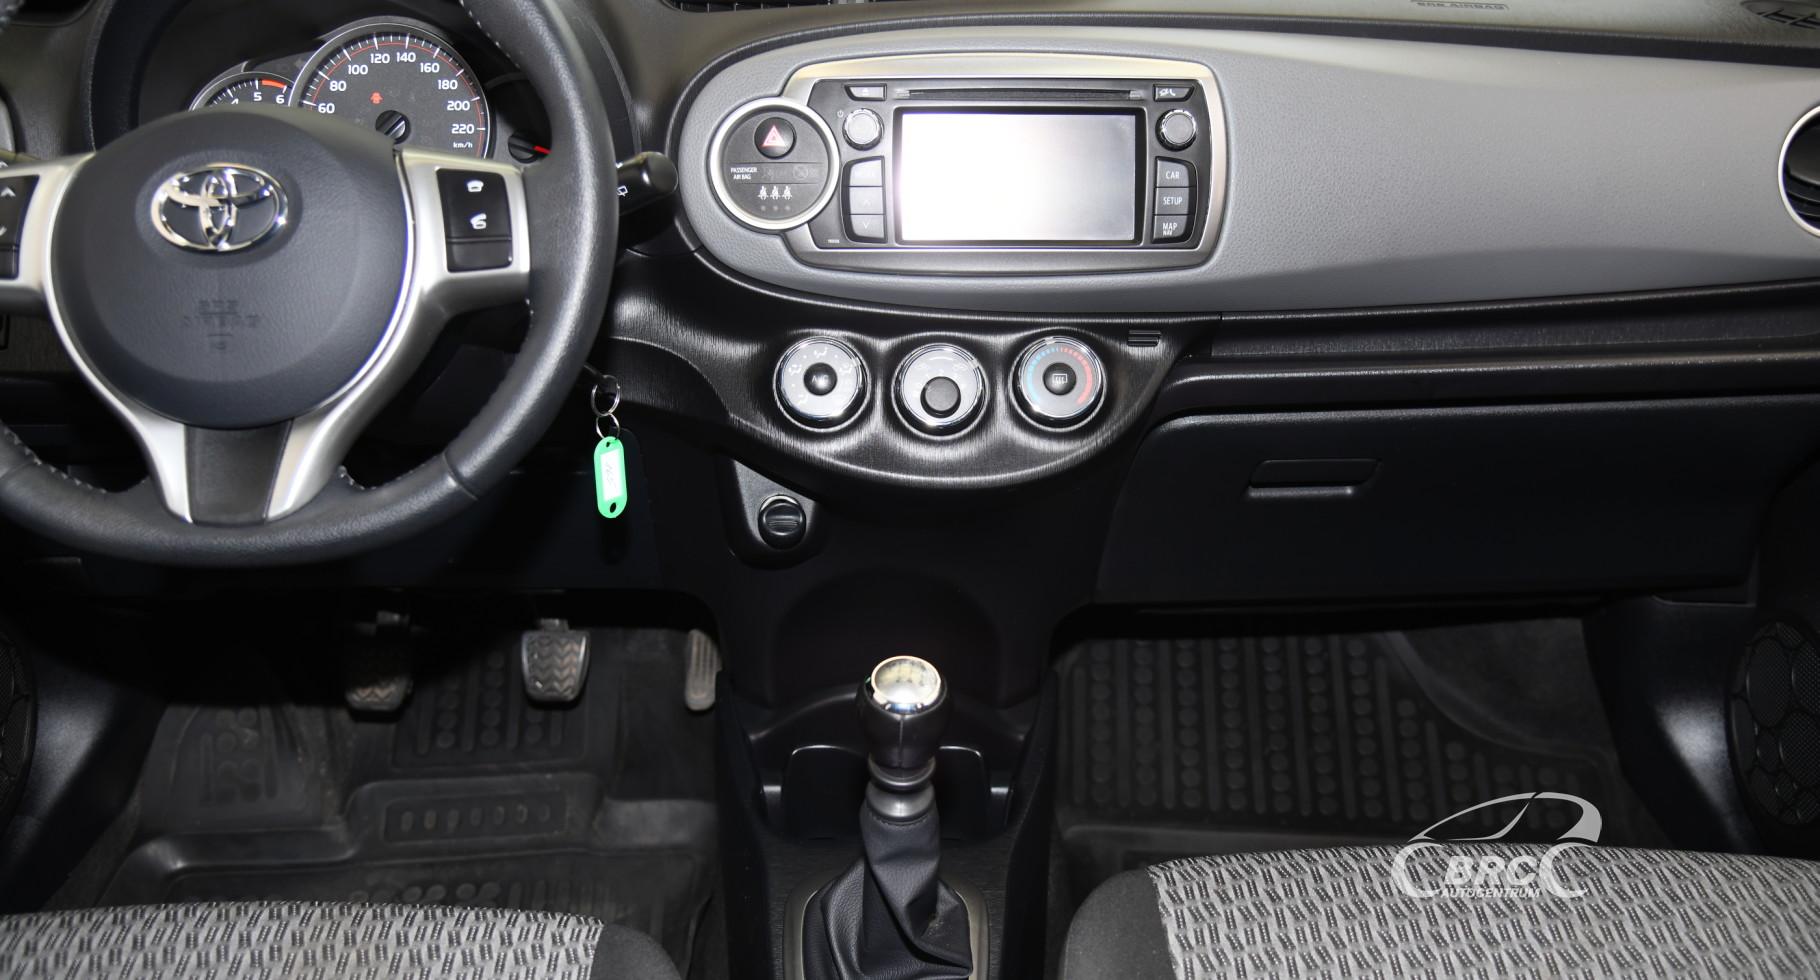 Toyota Yaris 1.4 D-4D Comfort